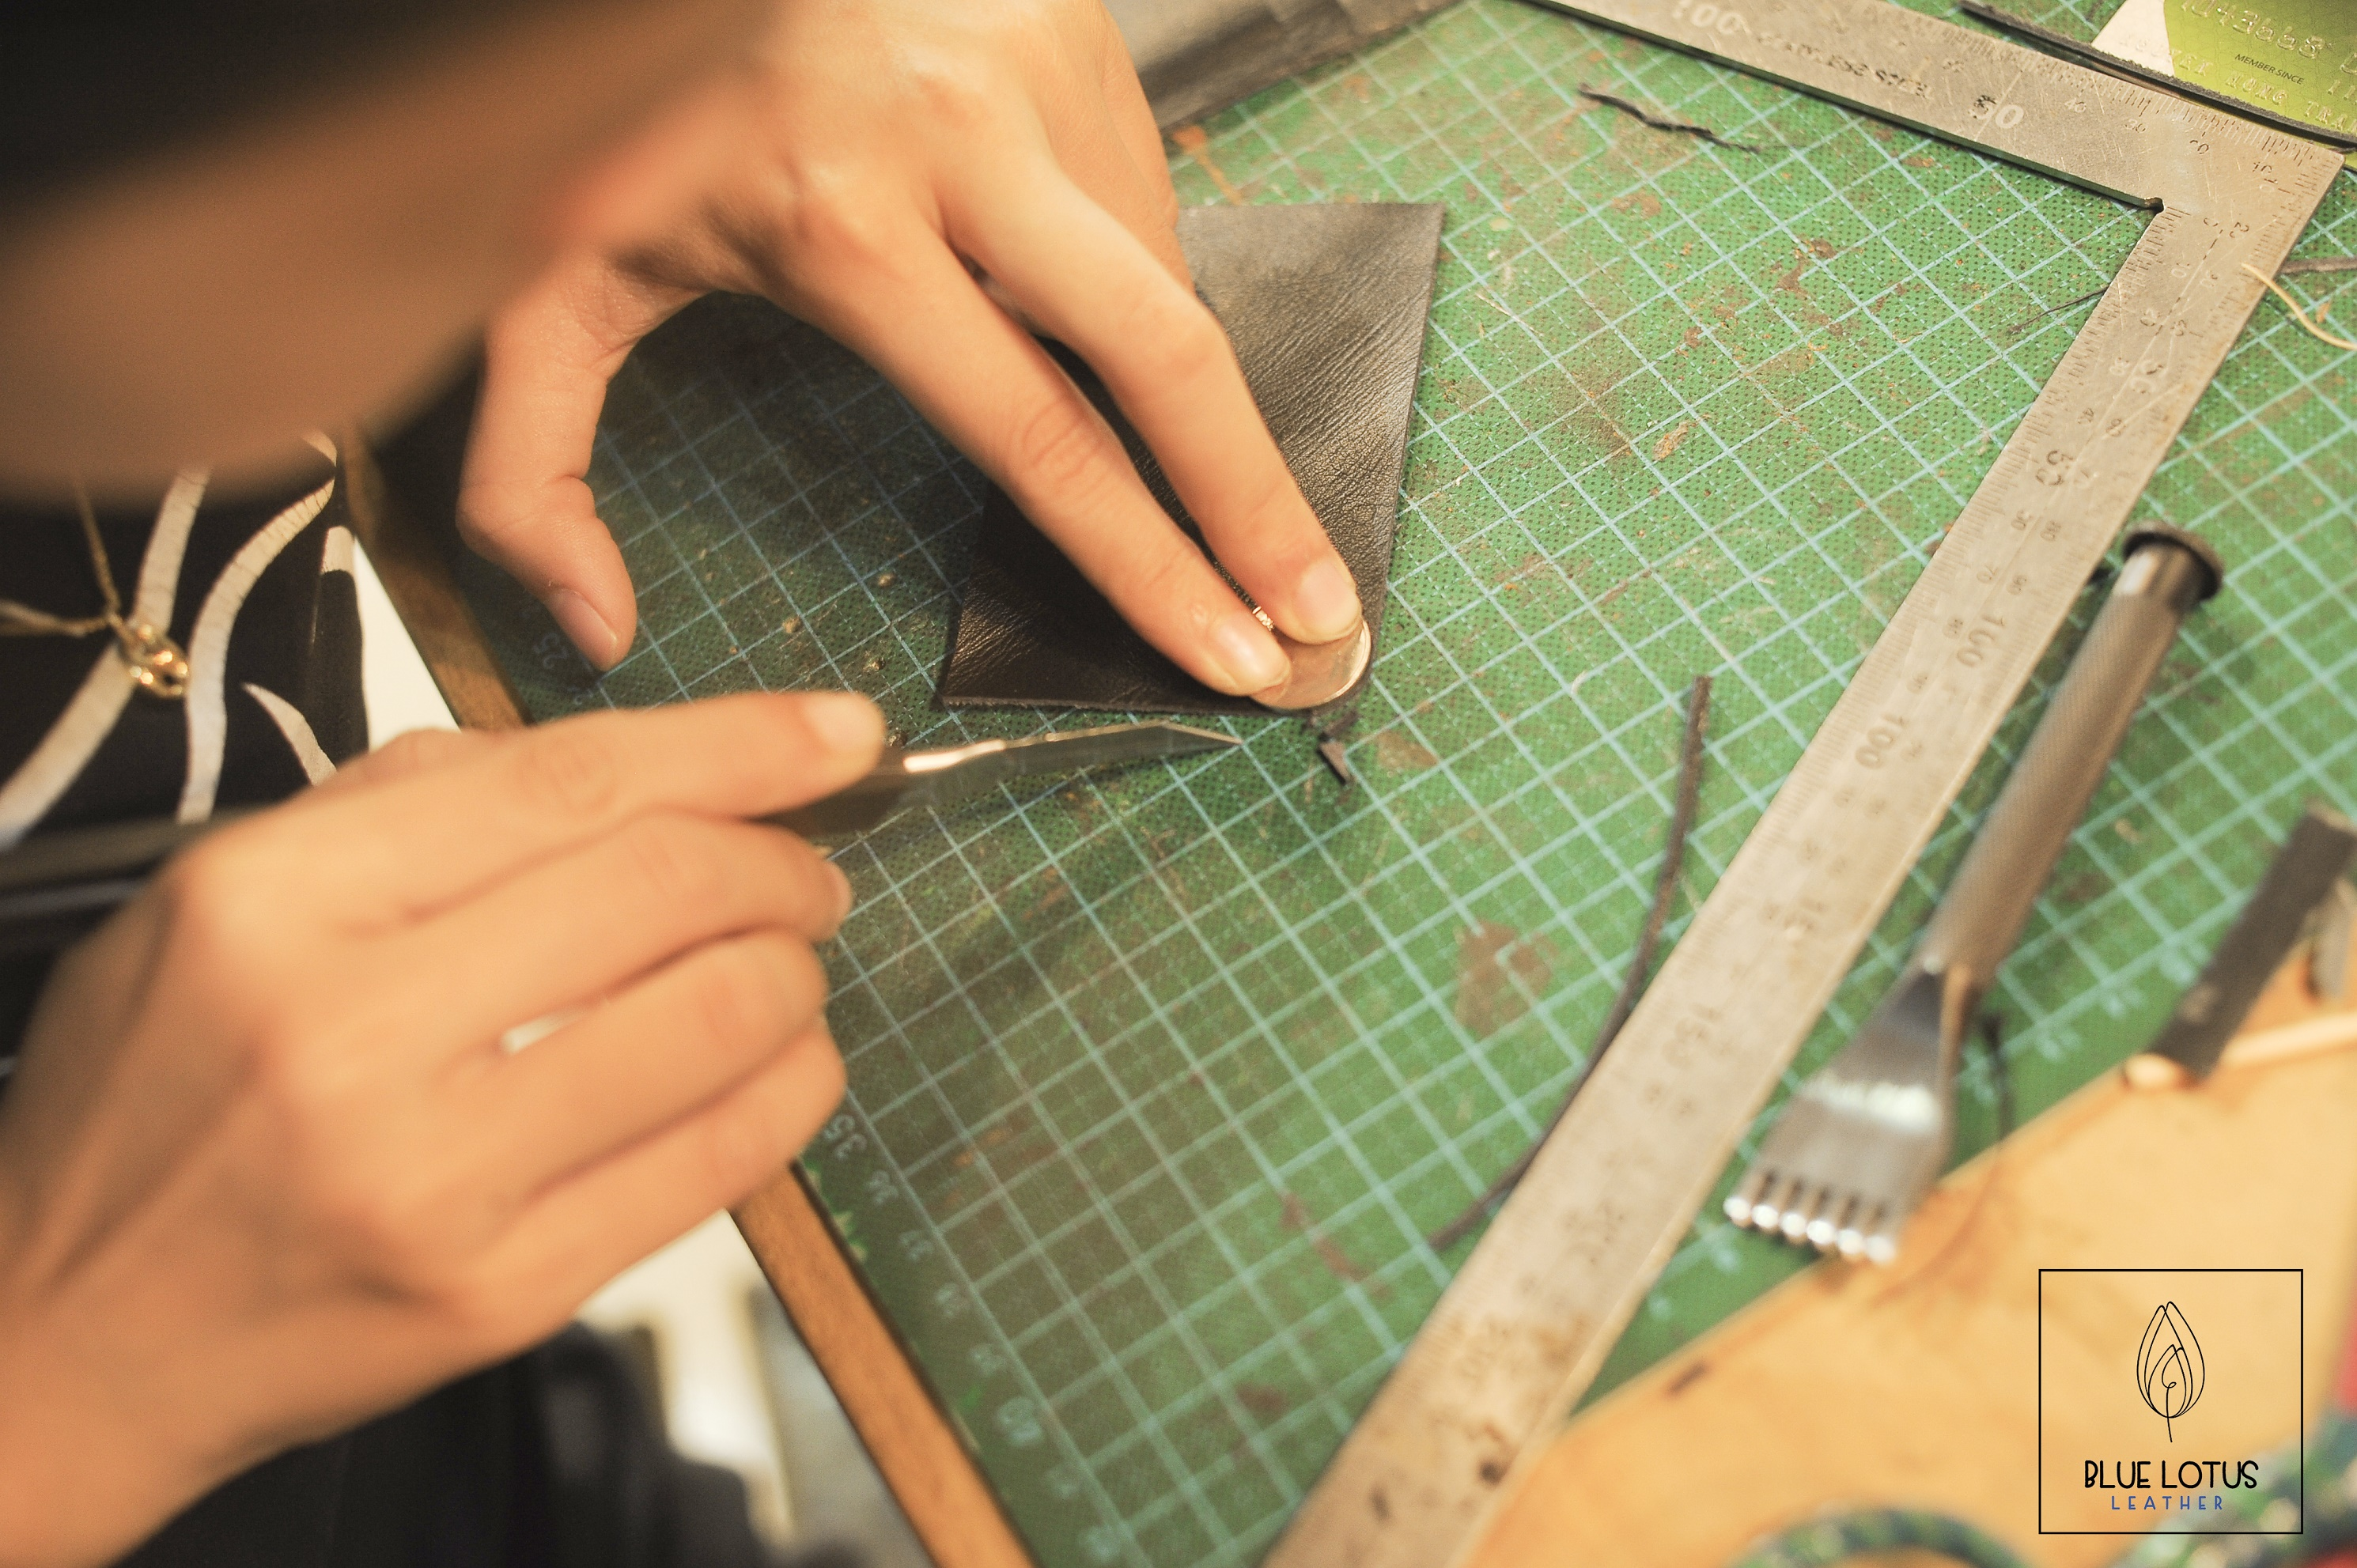 how to make DIY leather handmade men wallet; how to make DIY handmade leather men wallet; DIY; LEATHER; men wallet; handmade; blue lotus leather; leather men wallet; how to make DIY leather handmade men wallet